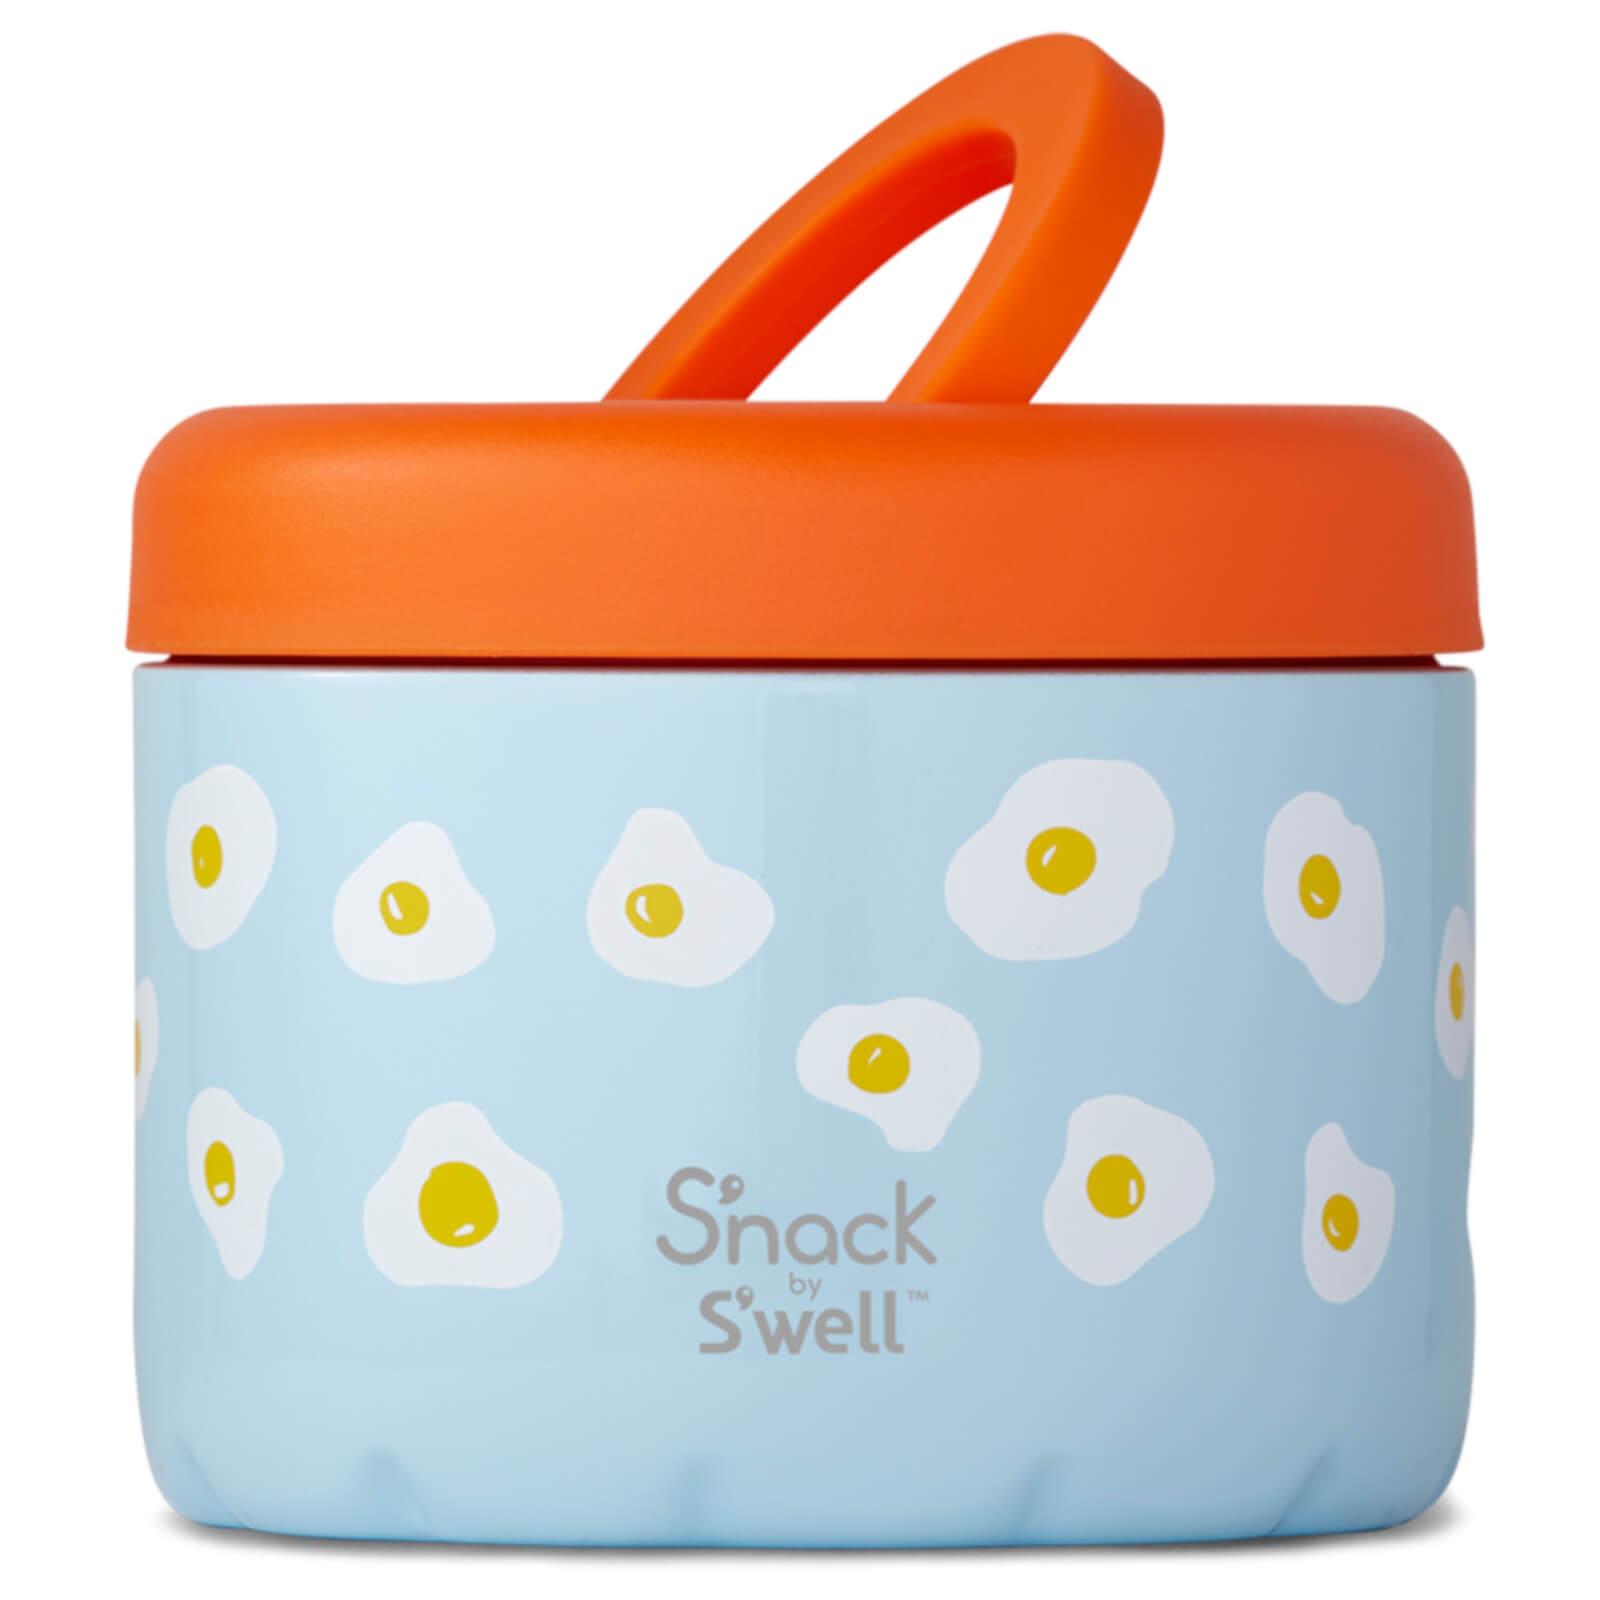 S'ip by S'well S'nack by S'well Over Easy Eggs Food Container - 24oz